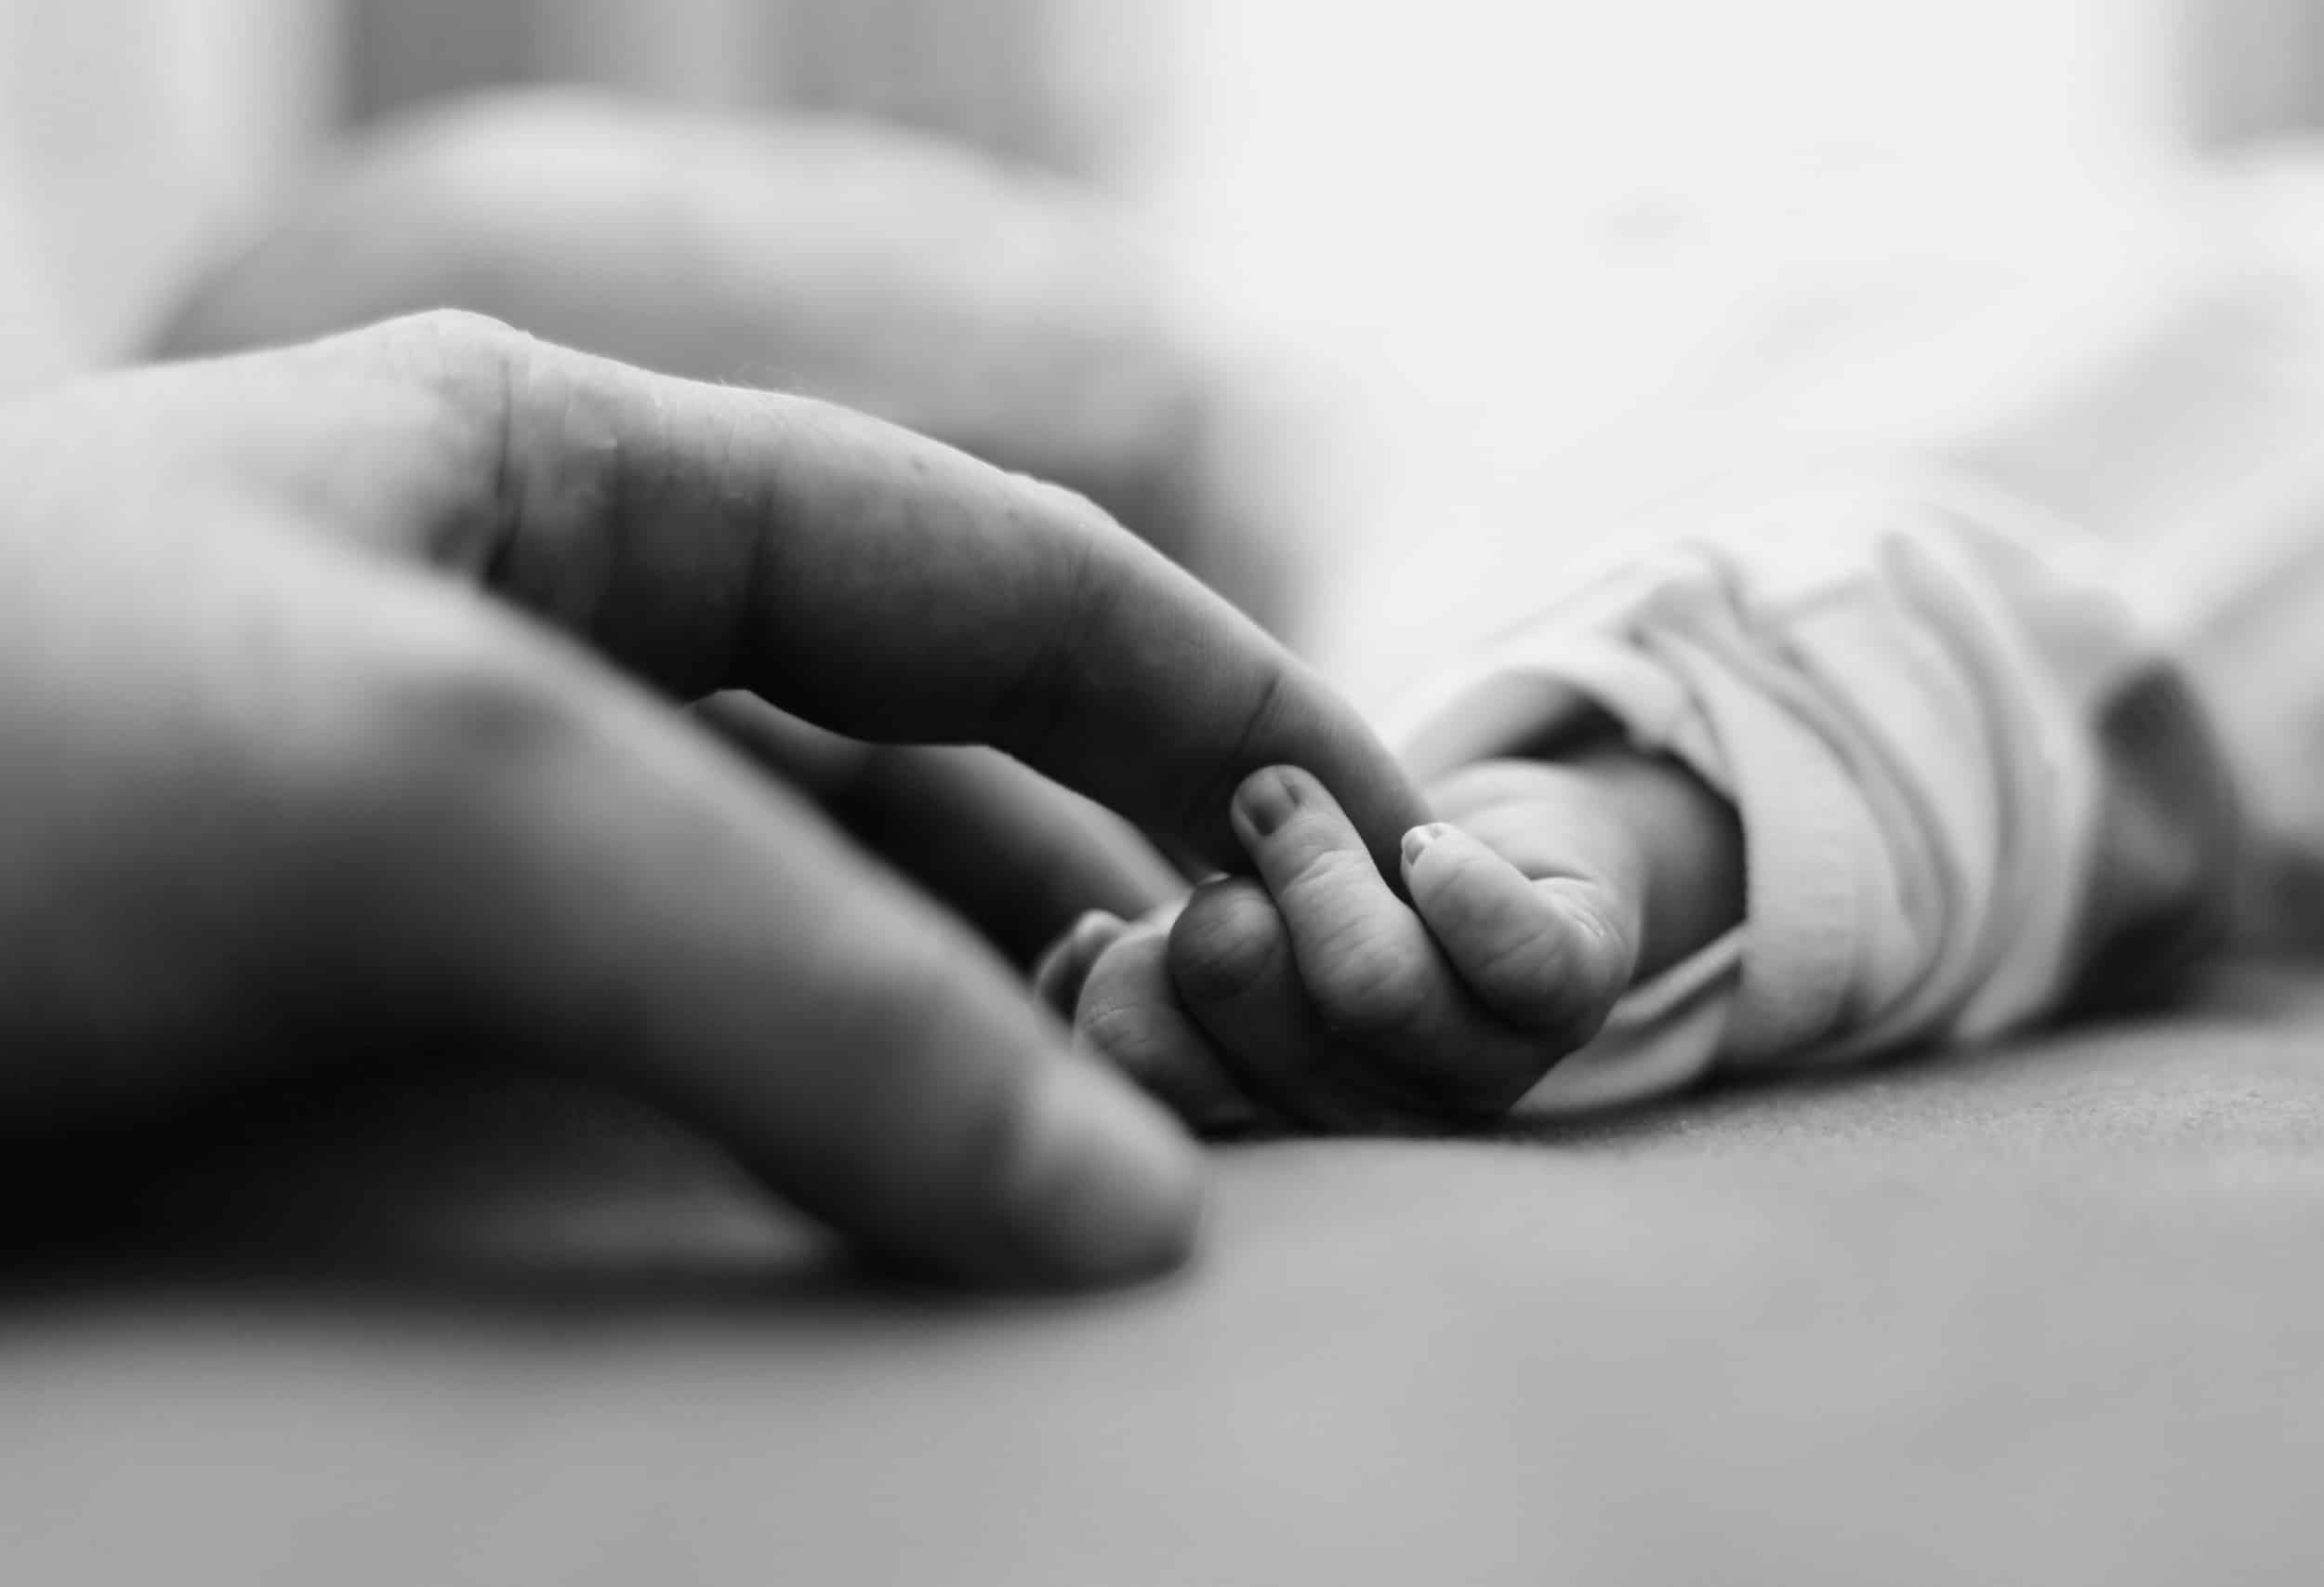 Fachtagung Perinataler Kindstod